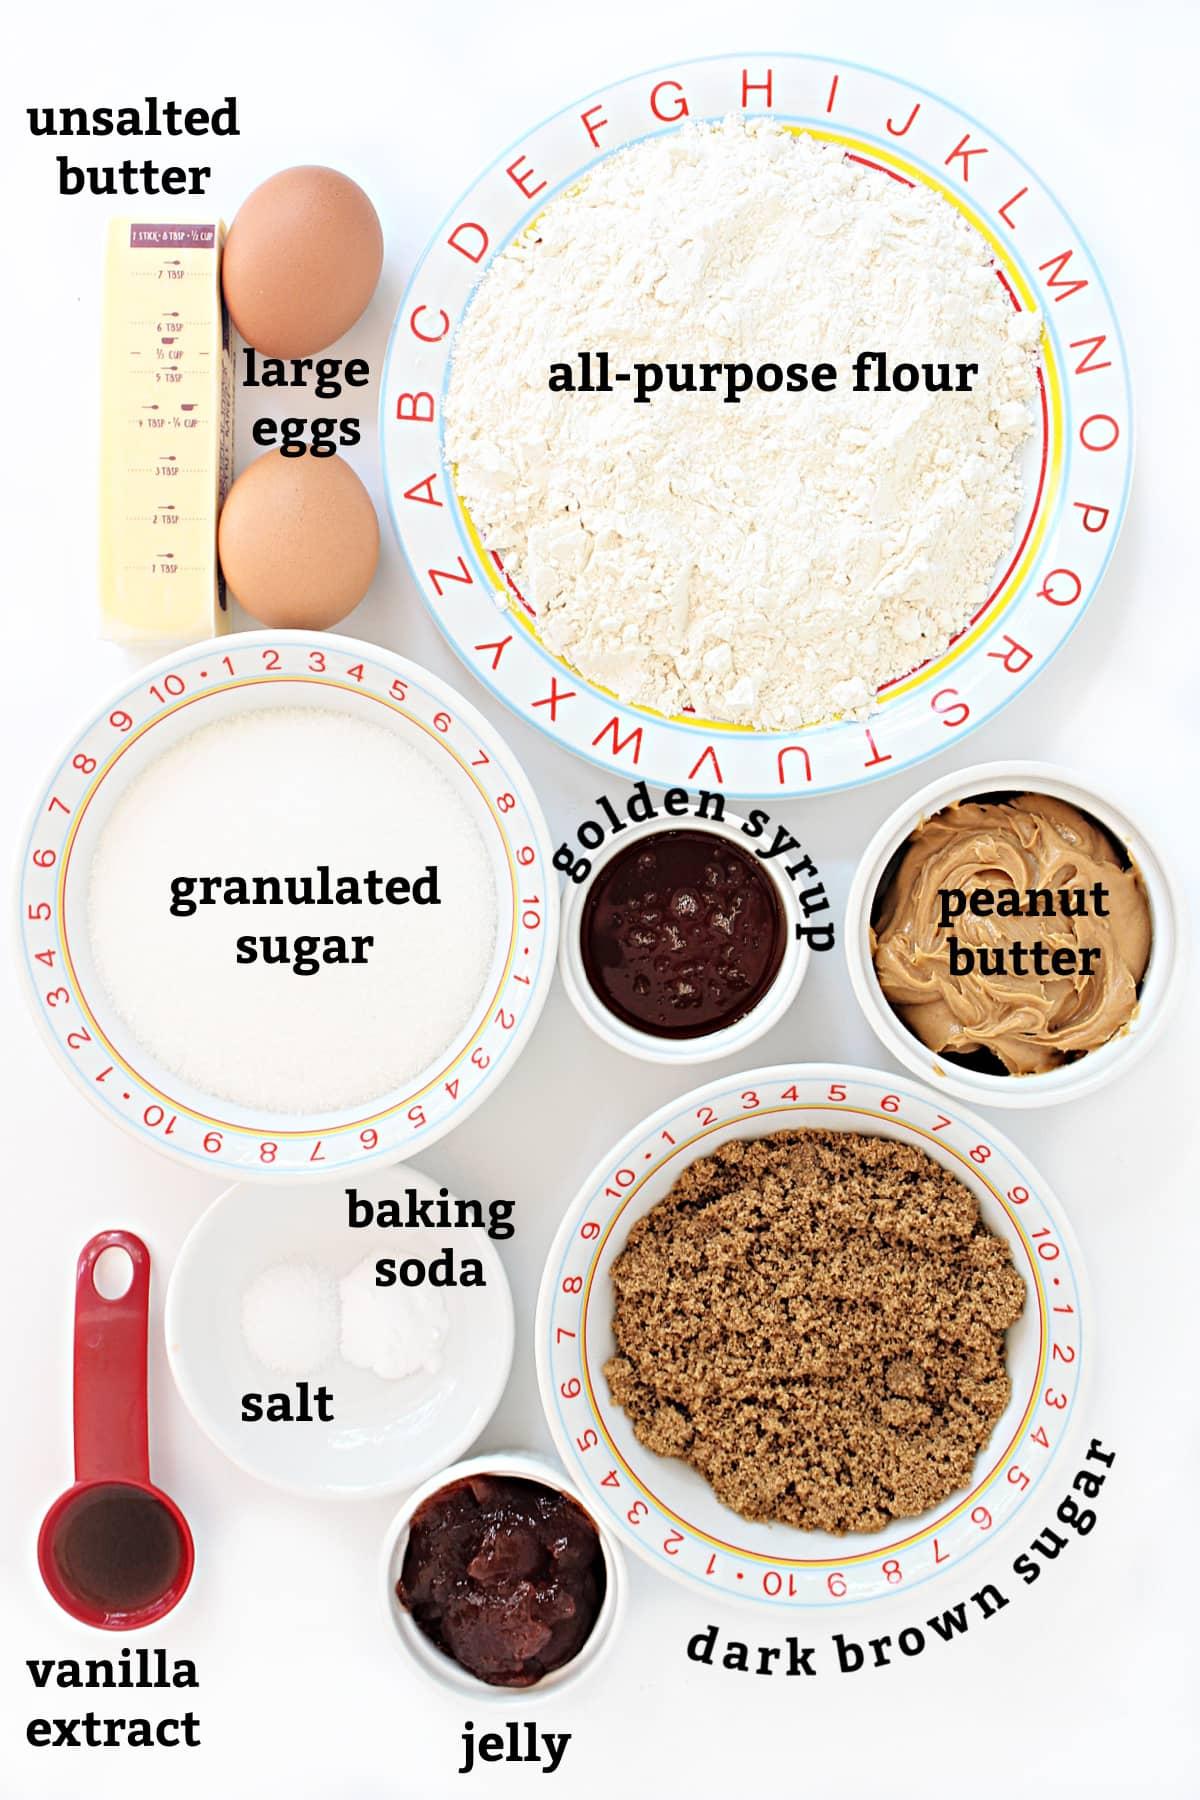 Recipe ingredients: flour, eggs, butter,  sugars, golden syrup, vanilla, baking soda, salt, peanut butter, jelly.